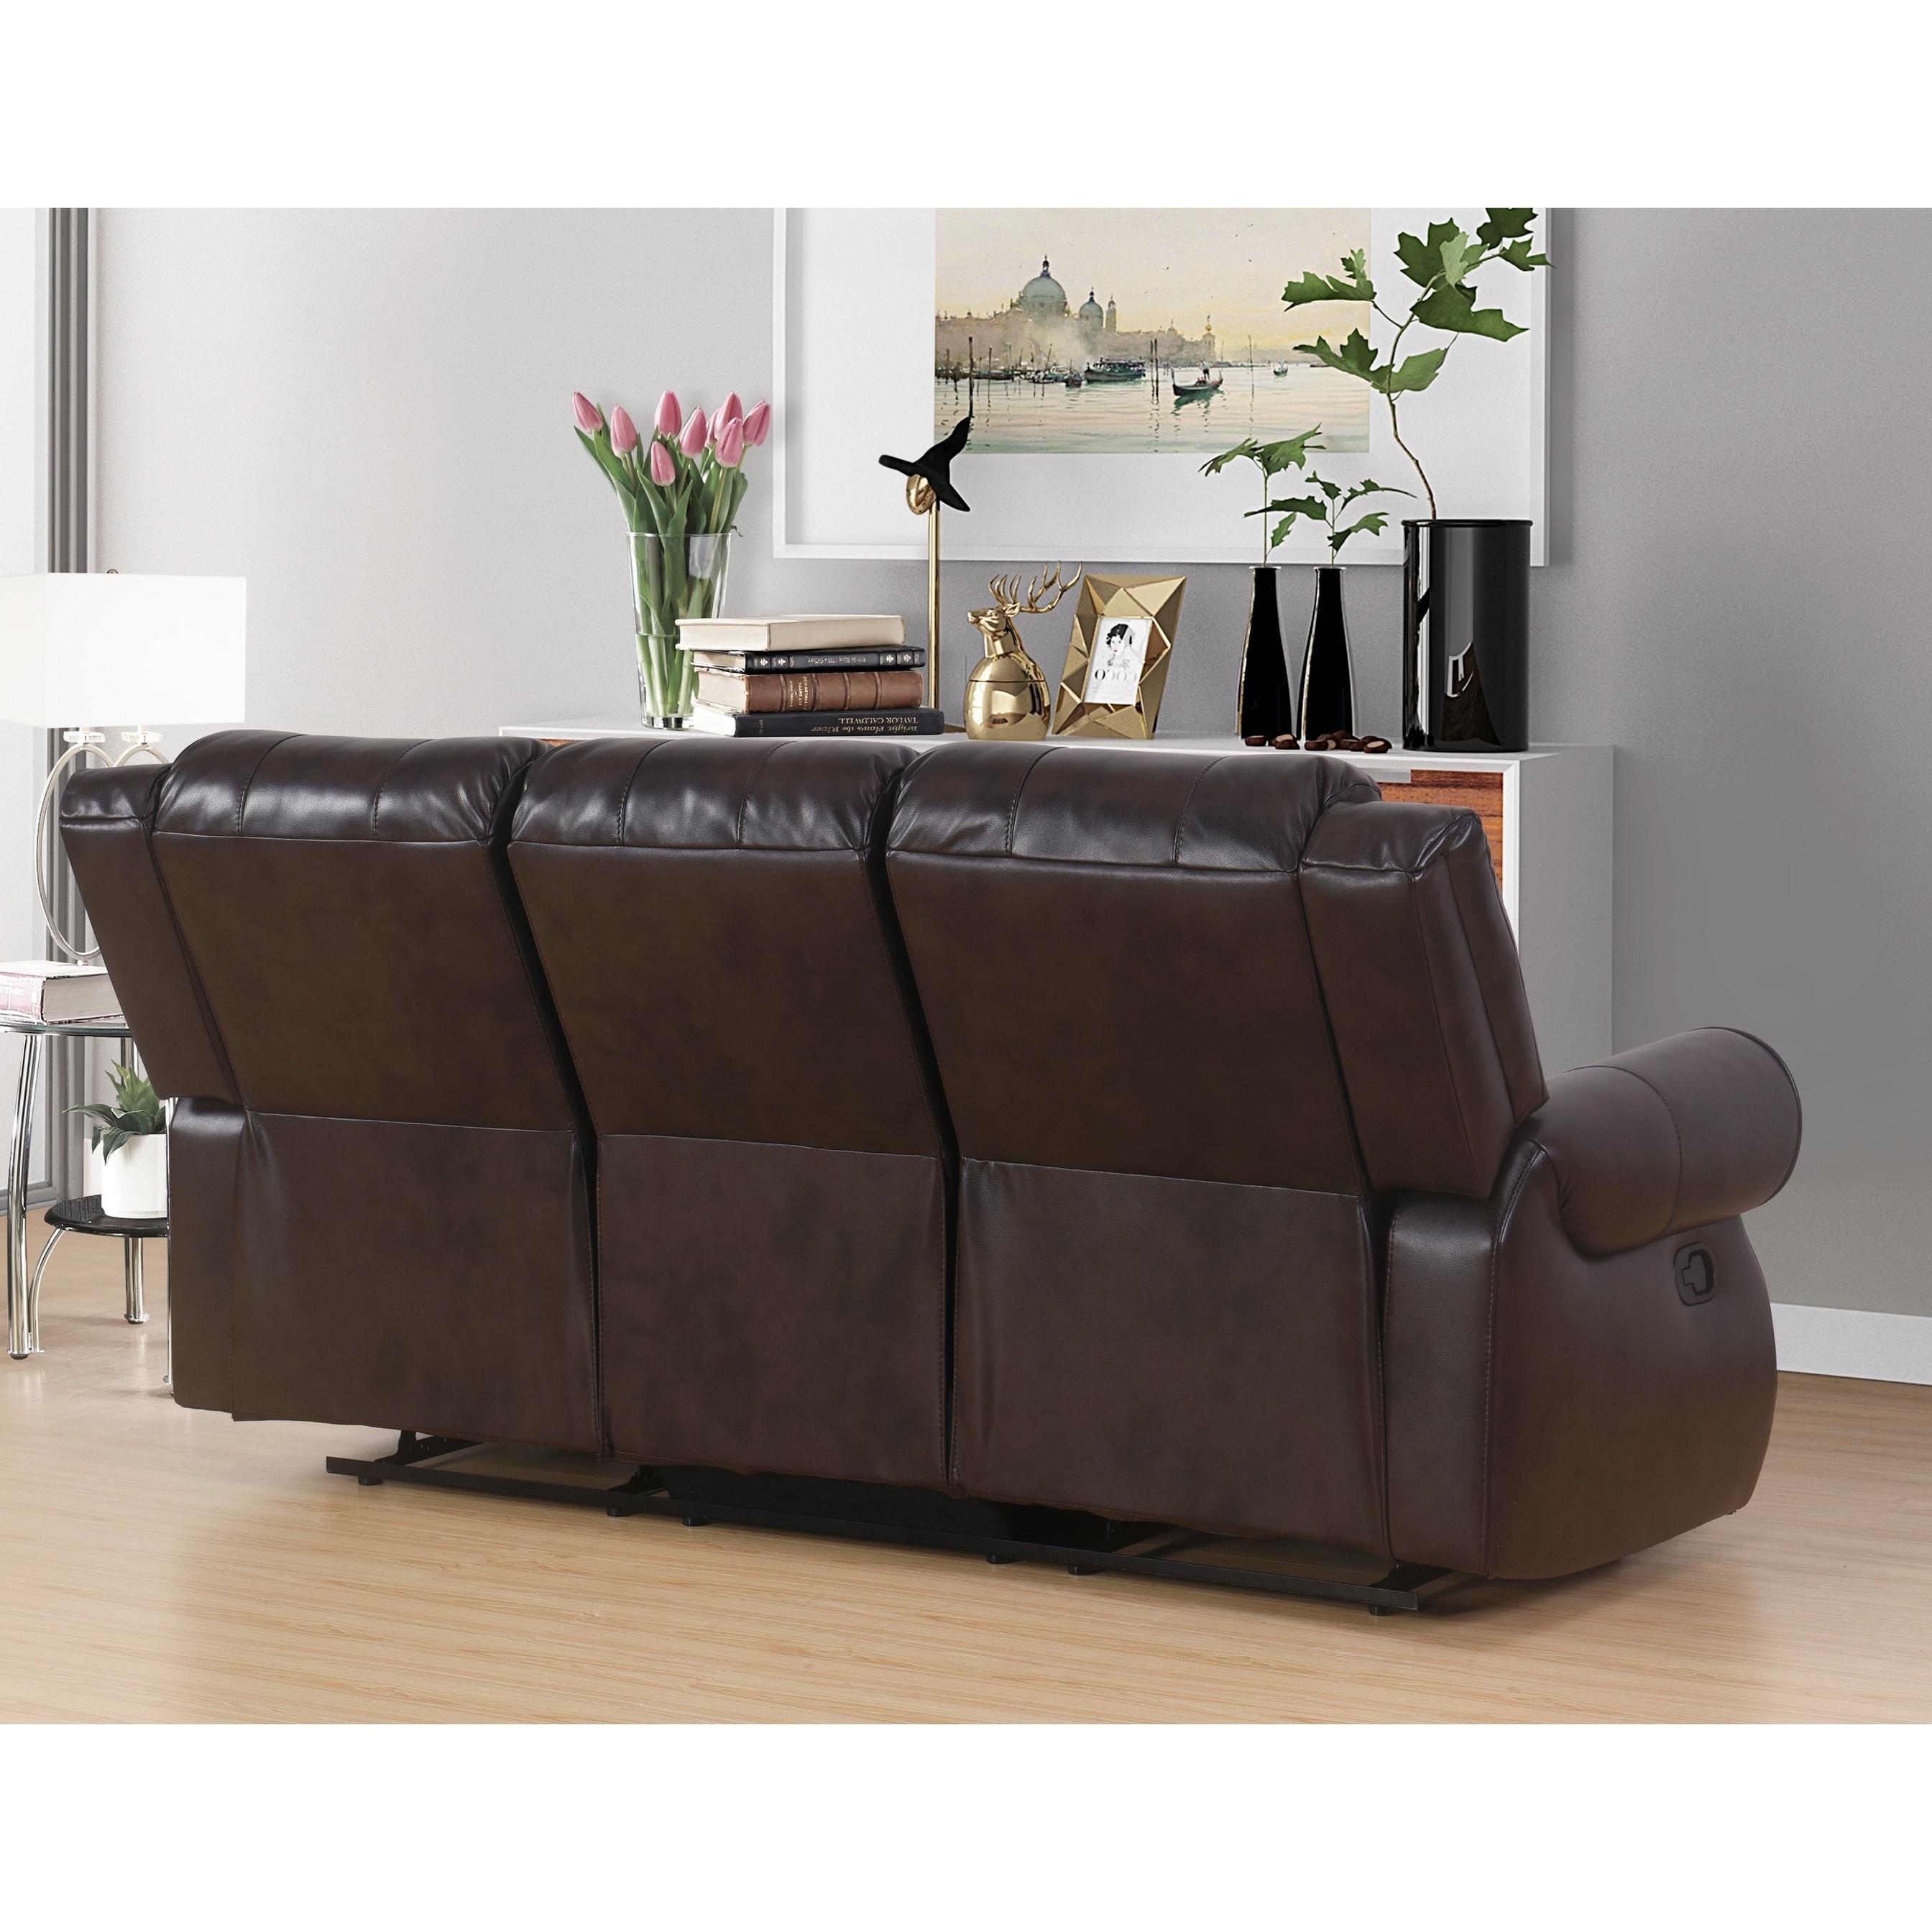 abbyson living bradford faux leather reclining sofa dark brown norwalk colton sectional